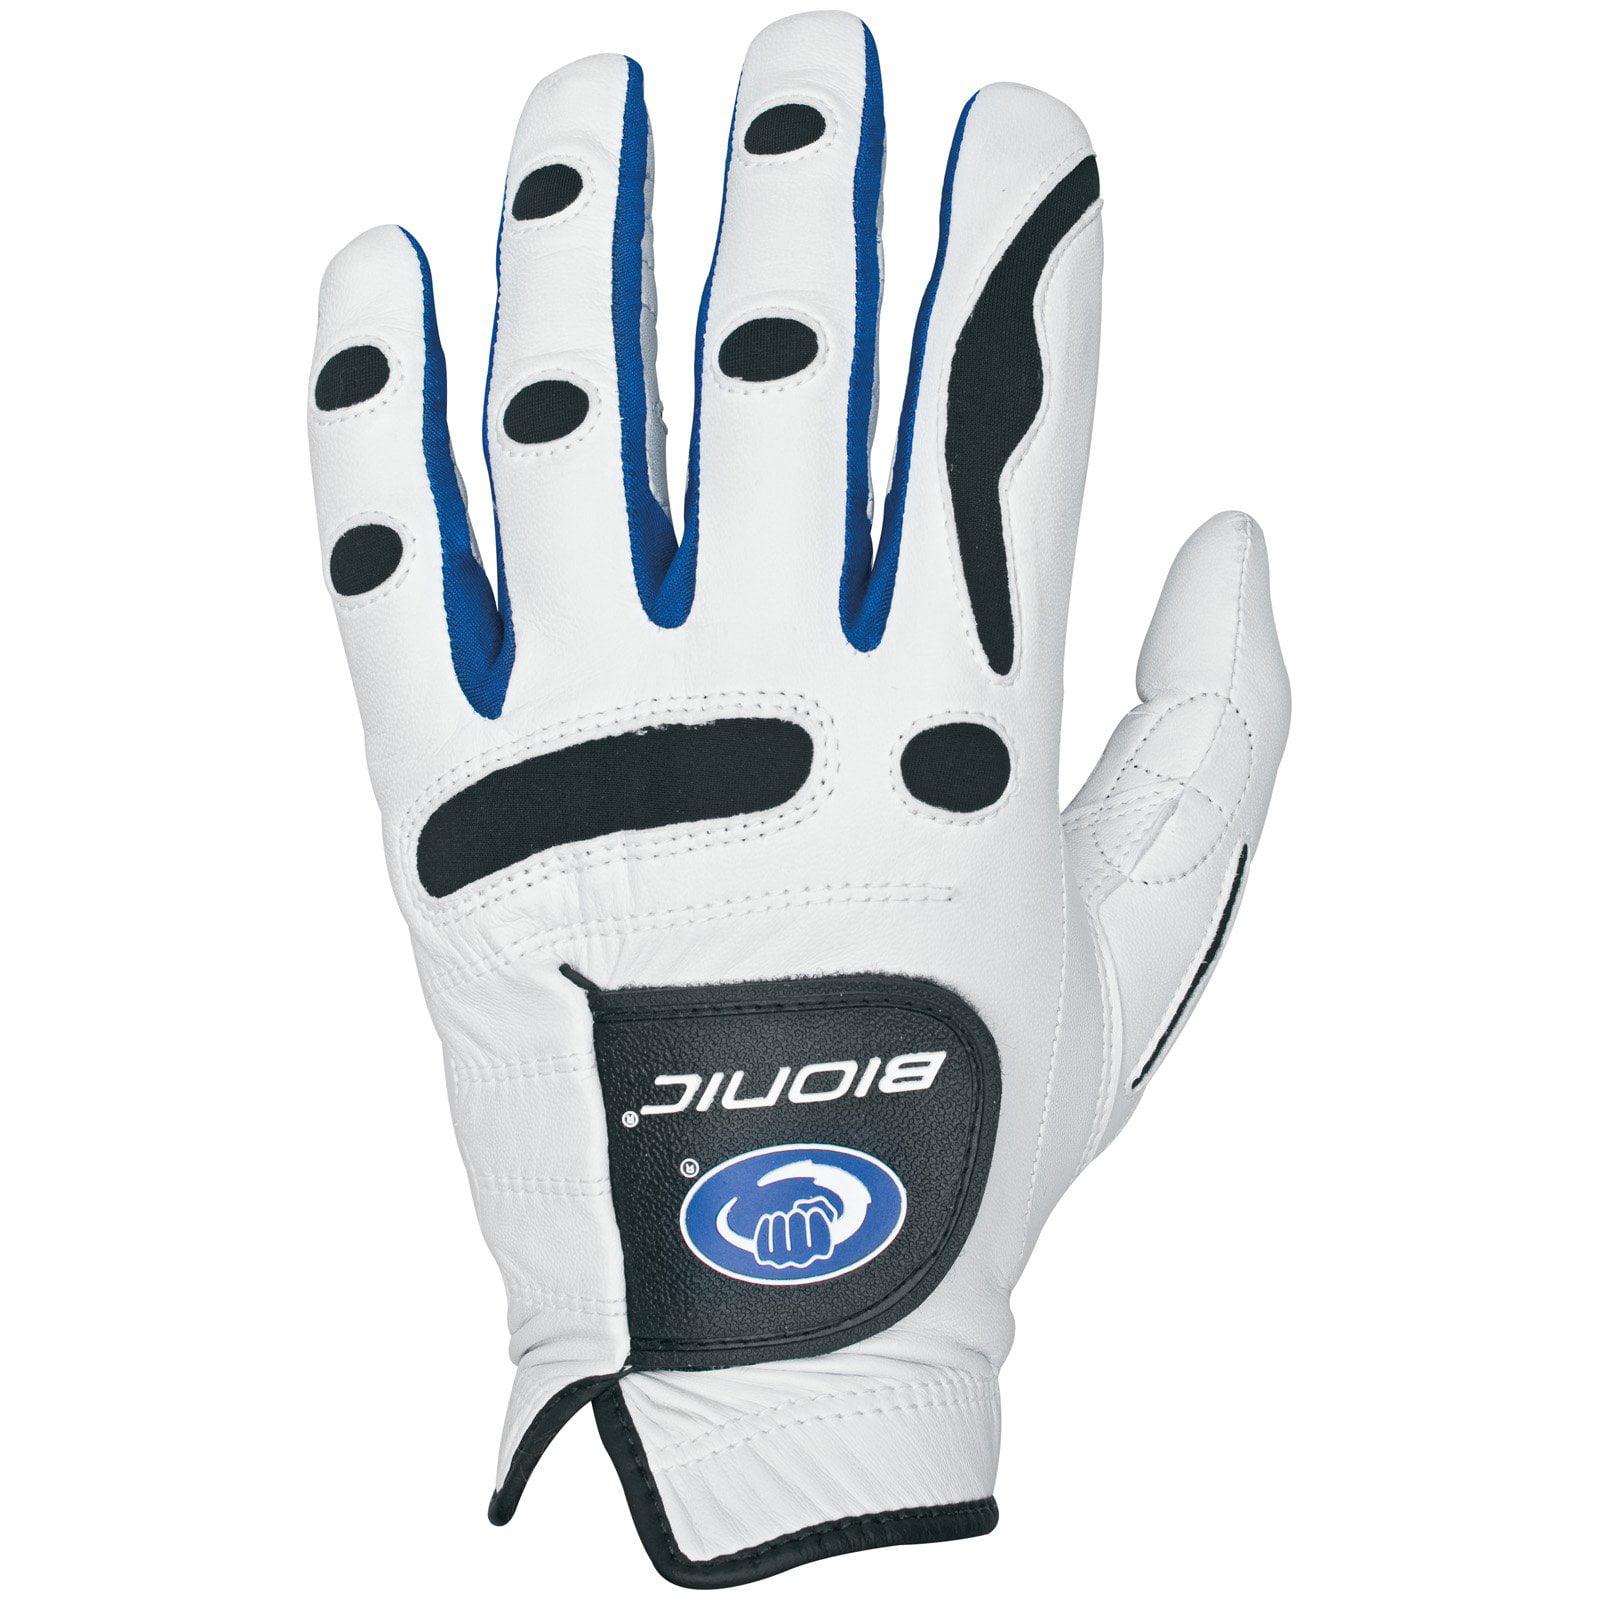 Mens gloves cadet - Bionic Men 39 S Left Hand Performance Series Cadet Golf Glove Walmart Com